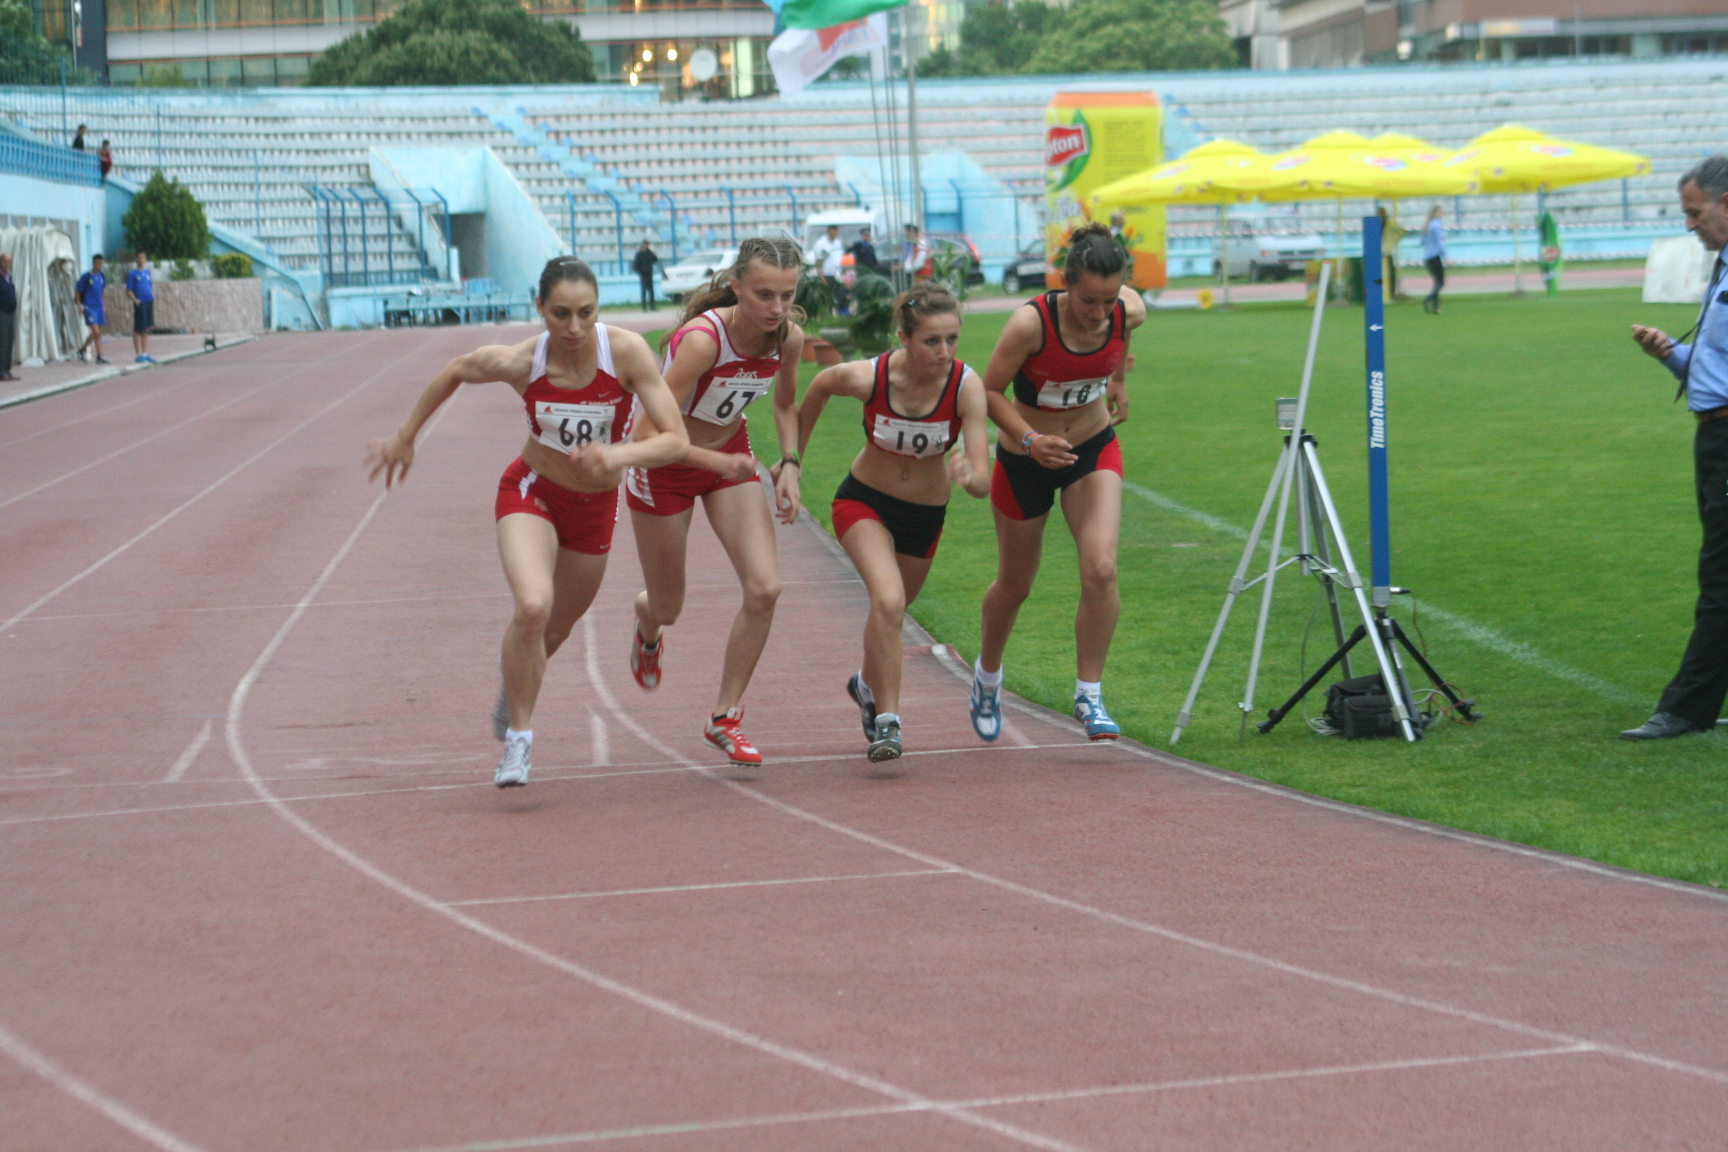 You are currently viewing Kampionati Kombëtar Kupa Nderi i Figurave Pietro Mennea, Tiranë 24.05.2012